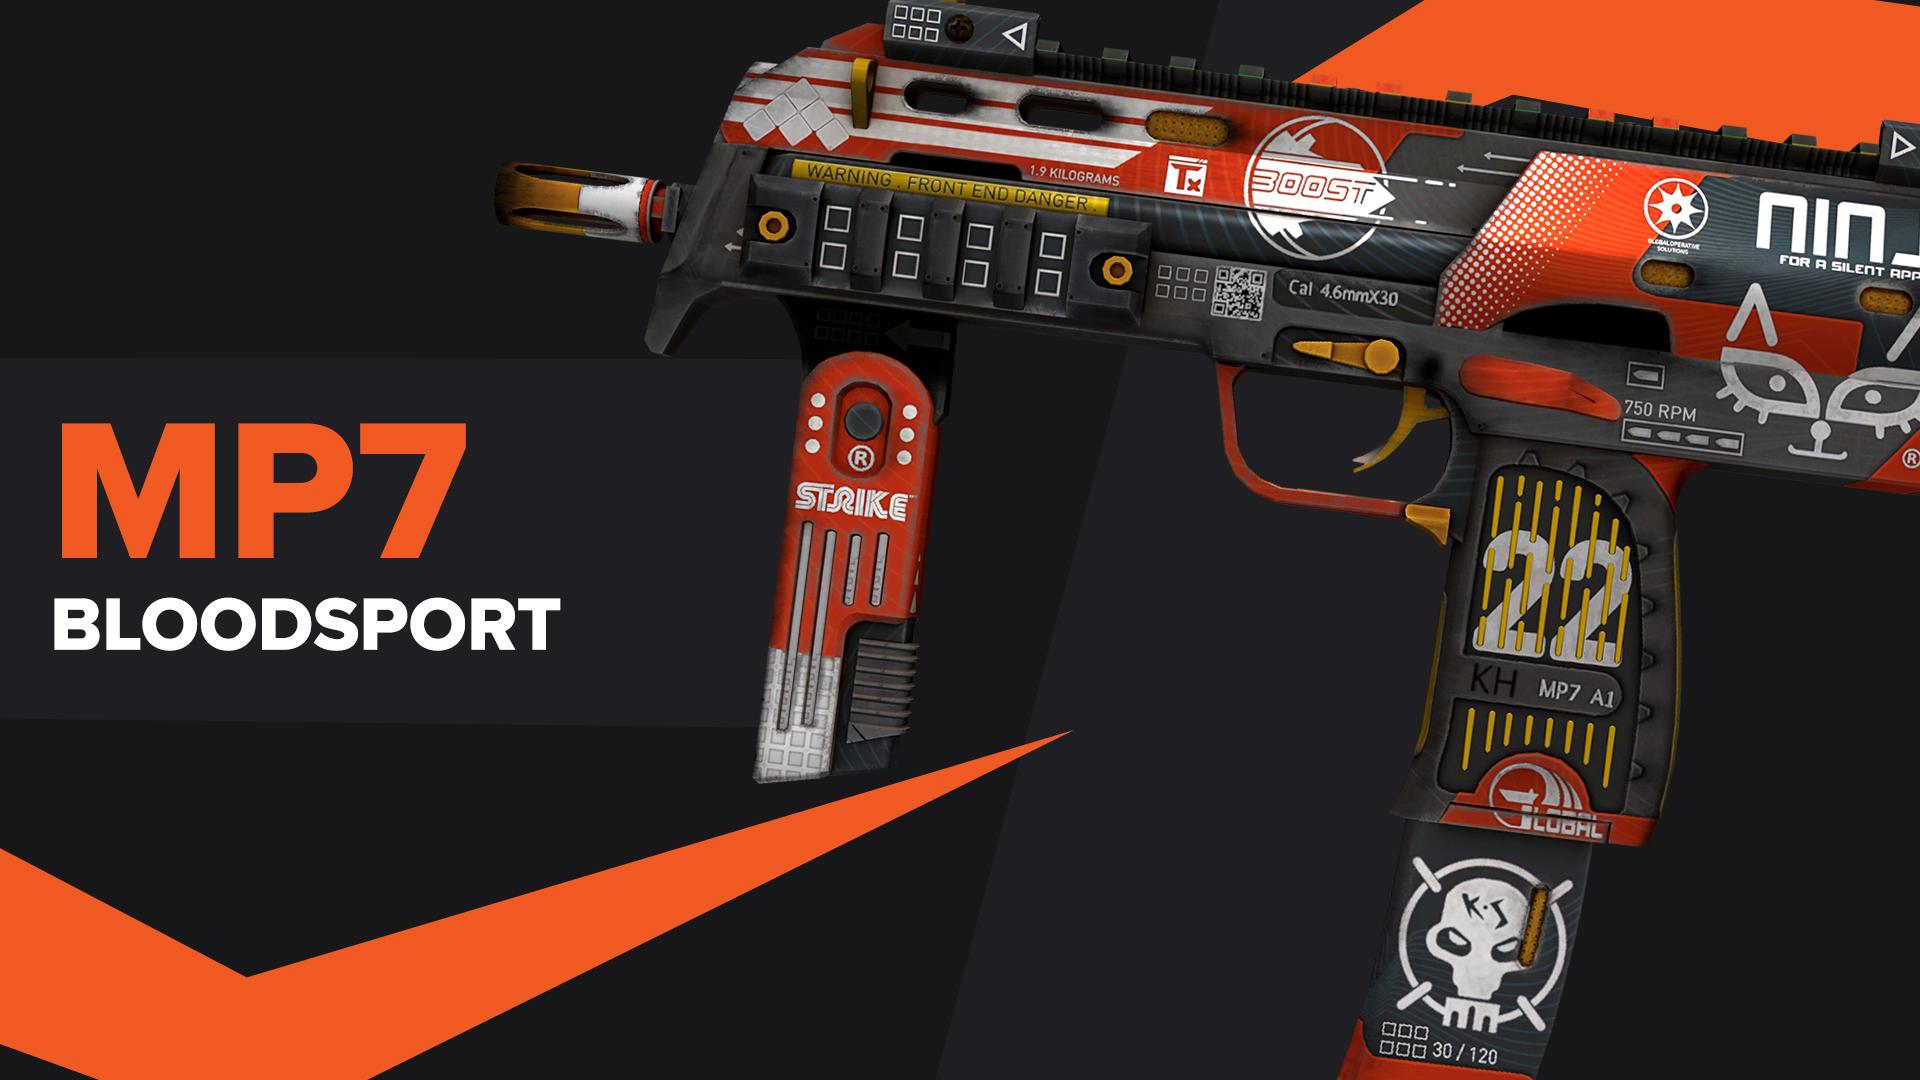 MP7 Bloodsport CSGO Skin